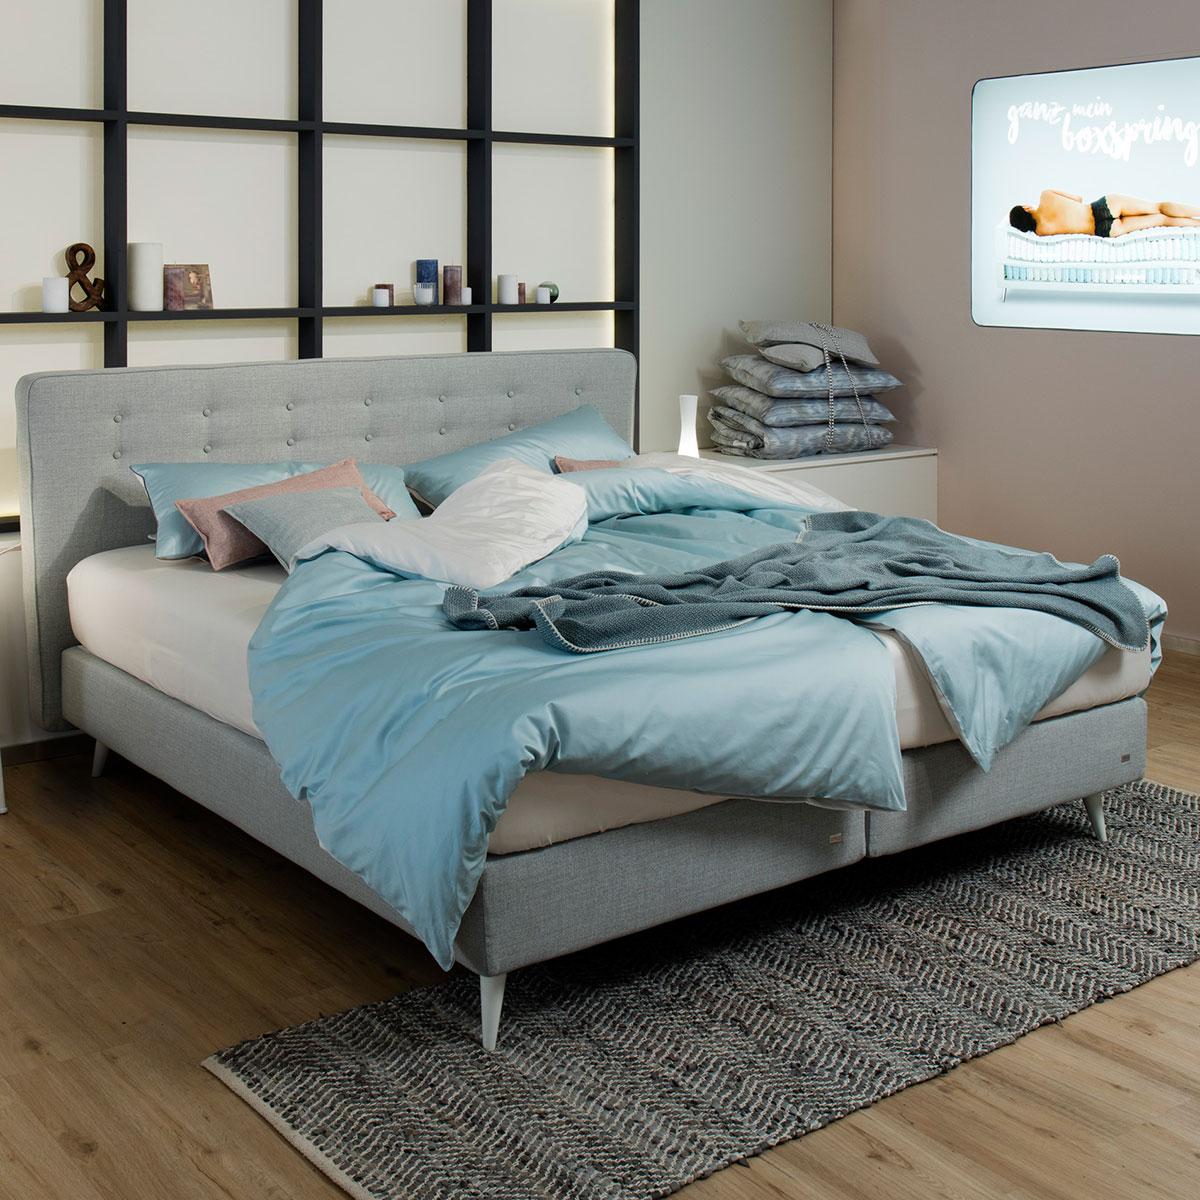 boxspringbett mio von ruf betten ca 180x200 cm flamme. Black Bedroom Furniture Sets. Home Design Ideas